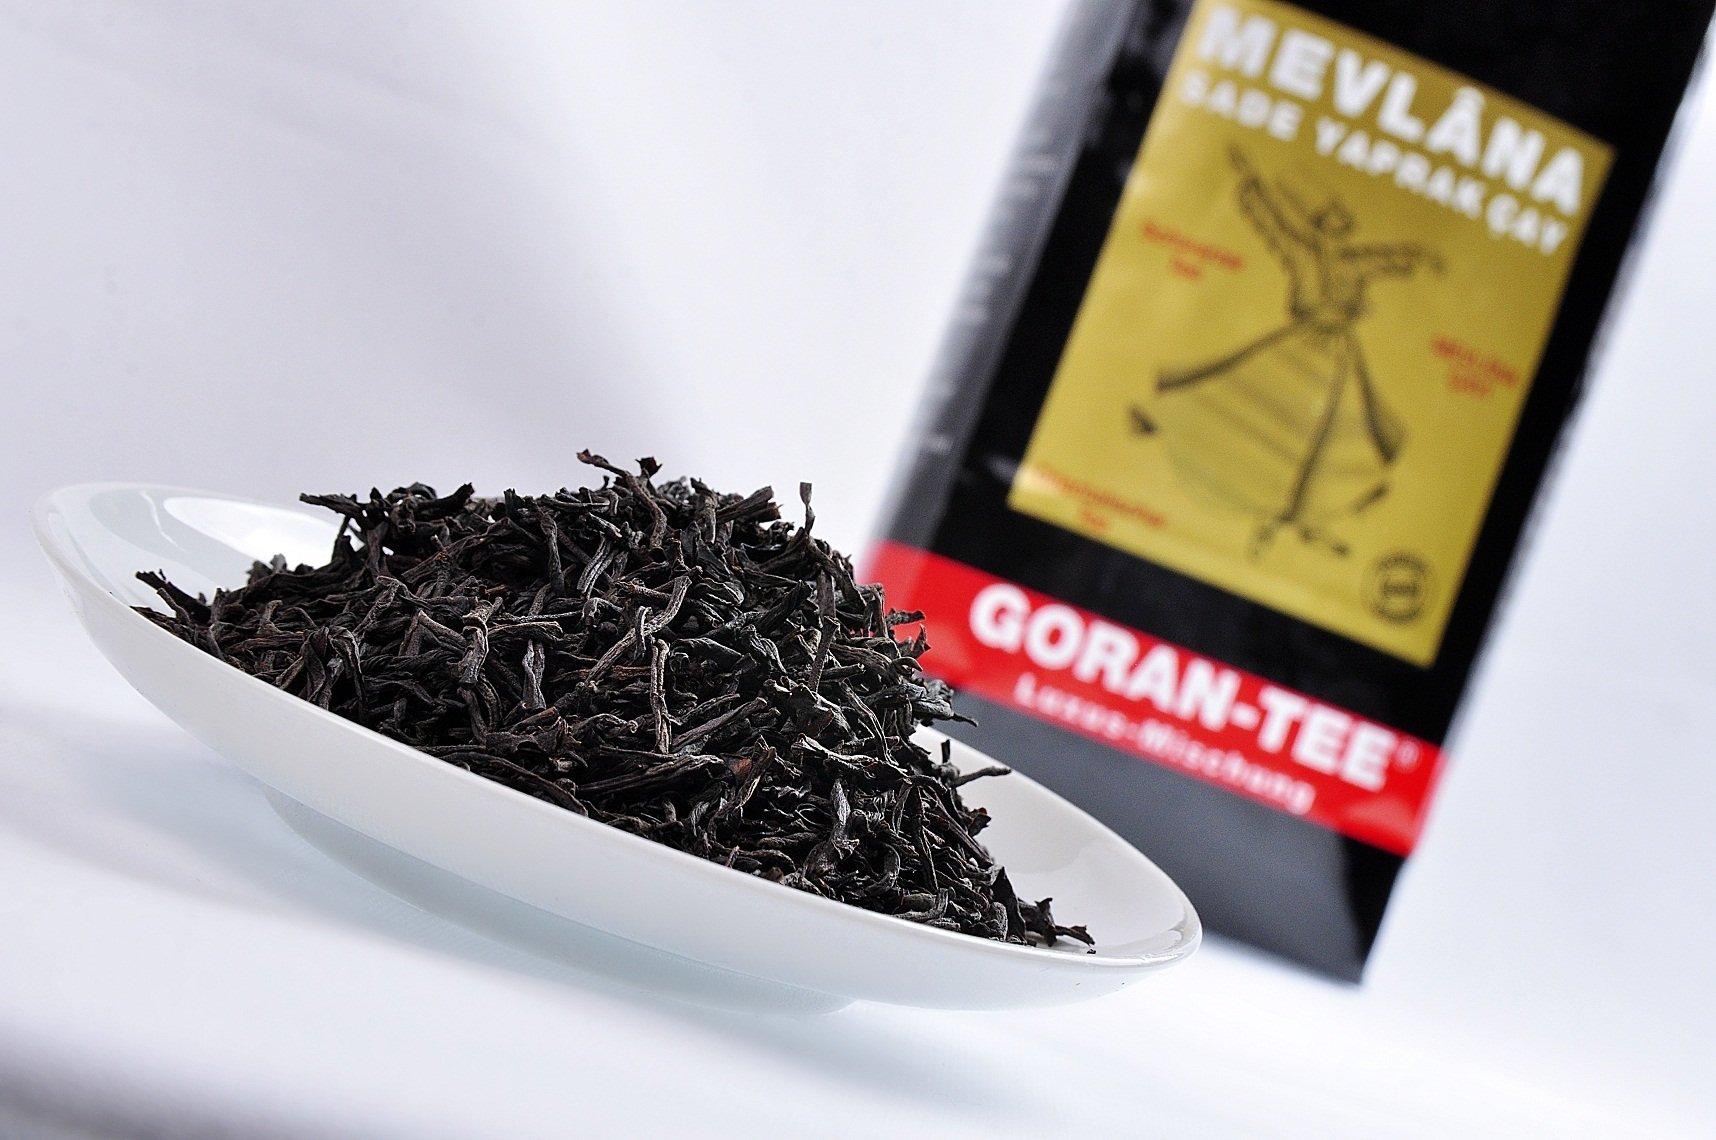 Goran-Mevlana-Premium-Ceylon-Teemischung-1er-Pack-1-x-1-kg